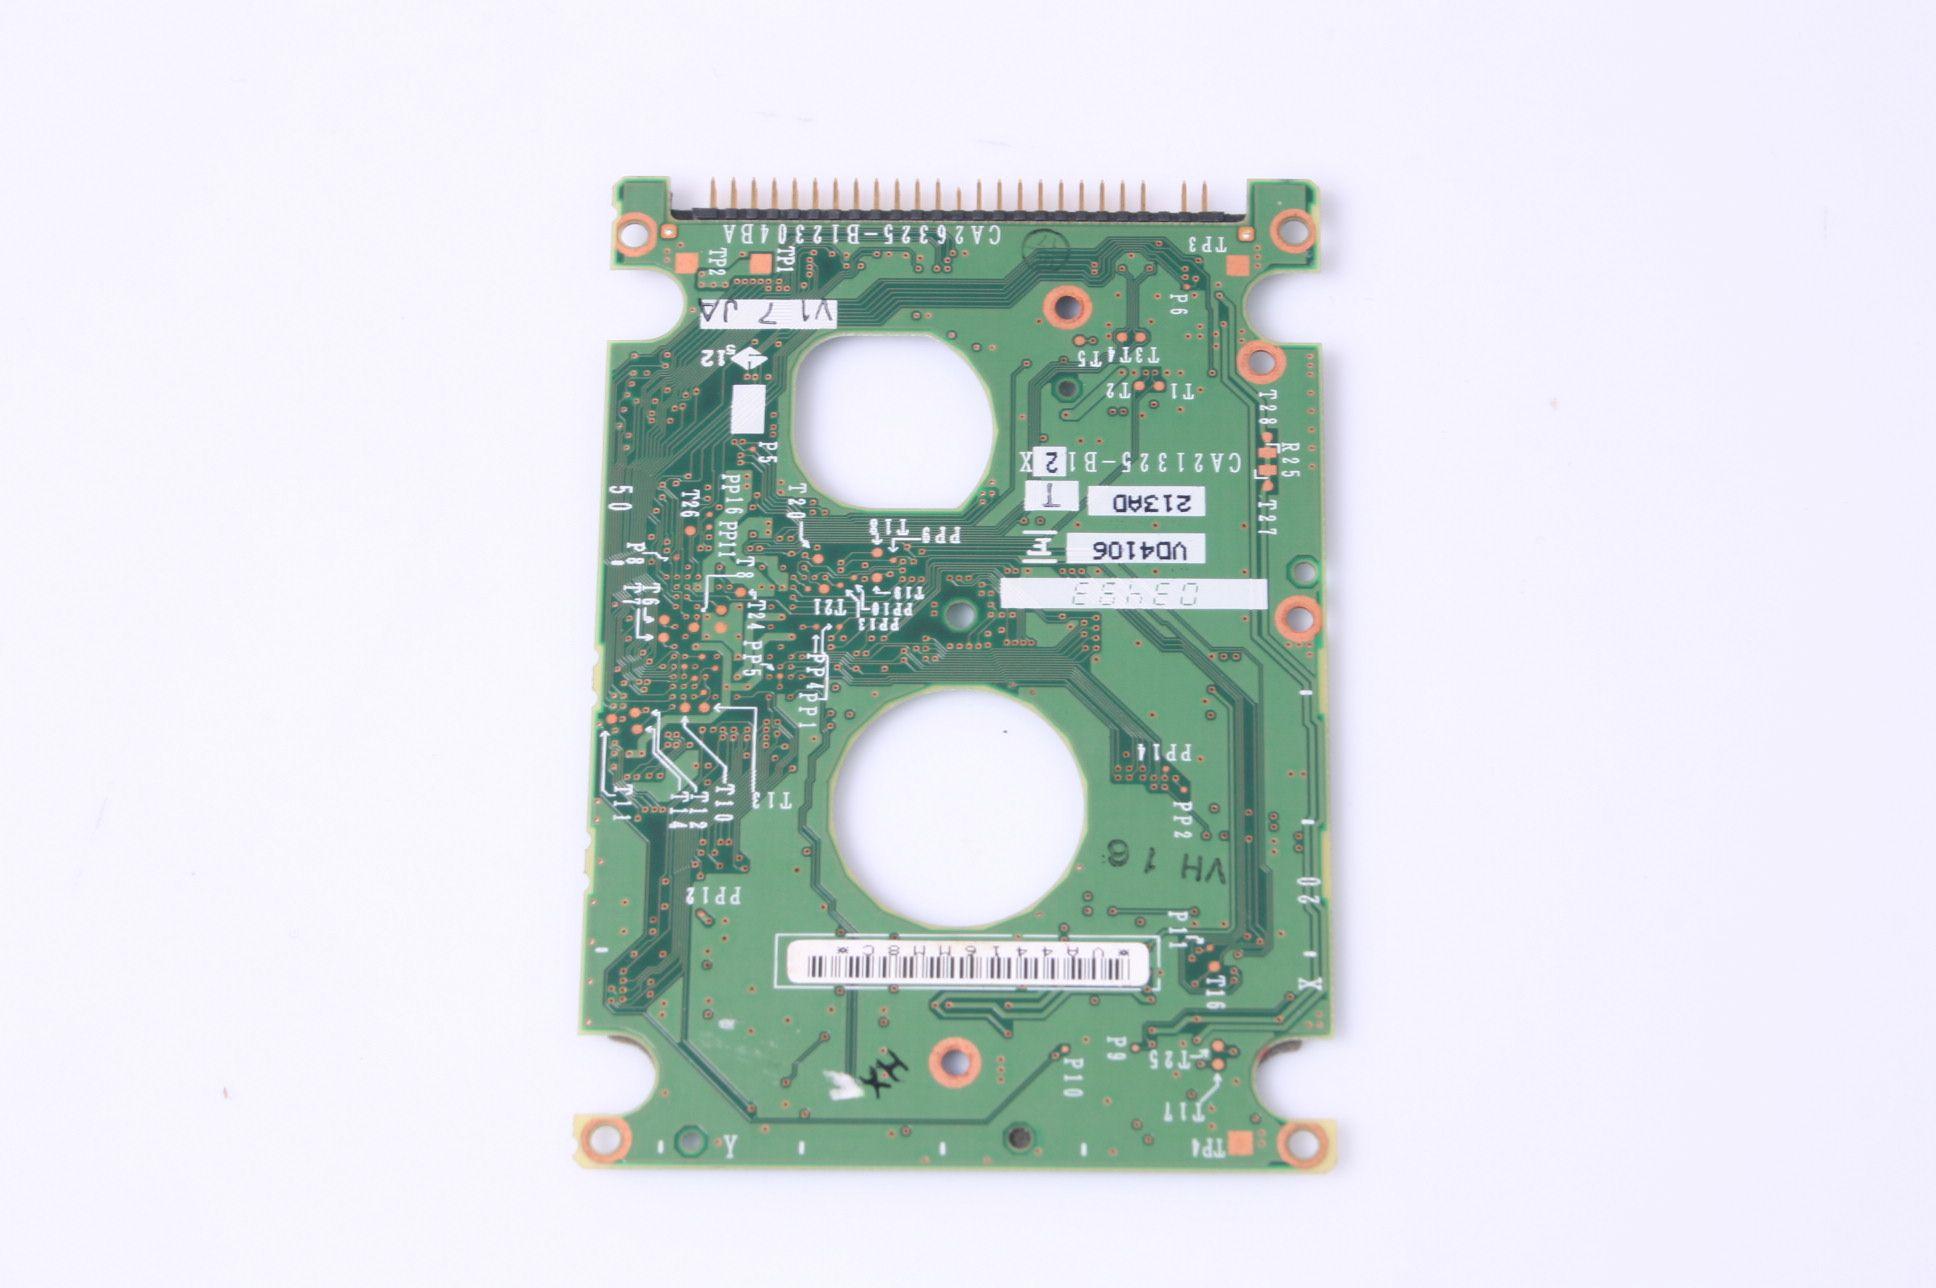 FUJITSU MHT2030AT 30GB 2.5 IDE HARD DRIVE / PCB (CIRCUIT BOARD) ONLY FOR DA